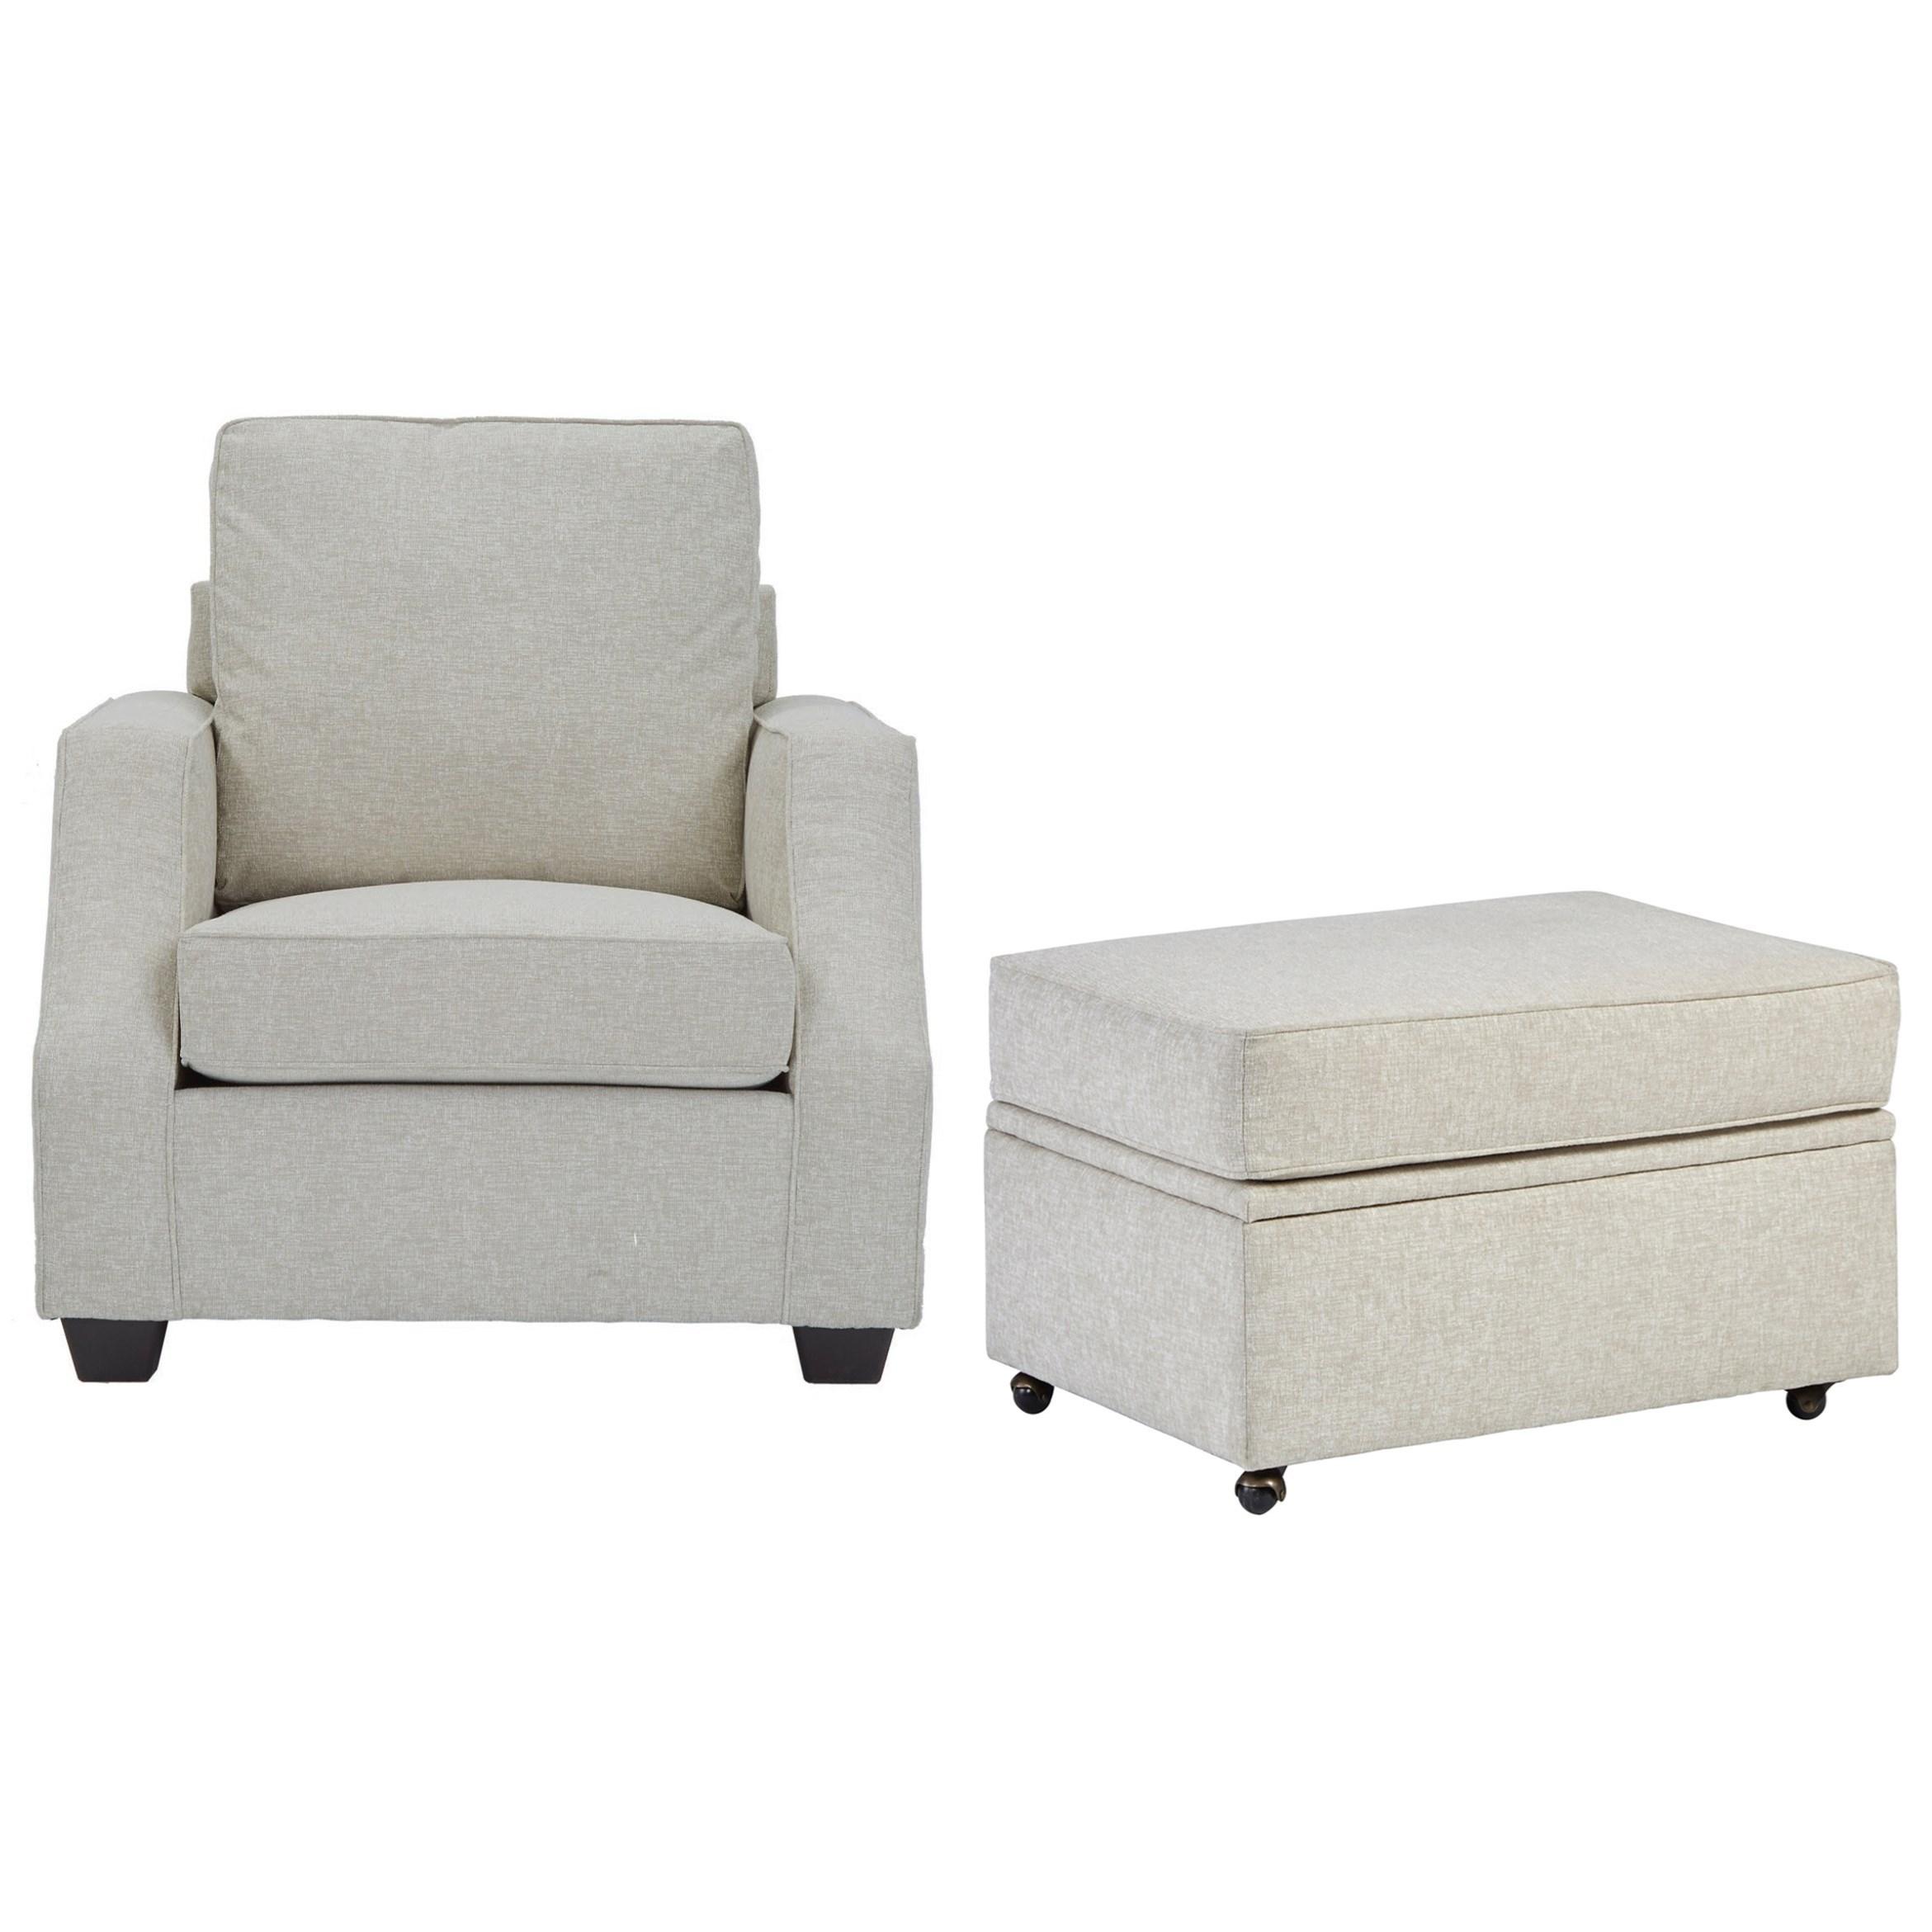 Progressive Furniture HadleyChair u0026 Castered Storage Ottoman ...  sc 1 st  Hudsonu0027s Furniture & Progressive Furniture Hadley Chair with Sloped Track Arms u0026 Castered ...